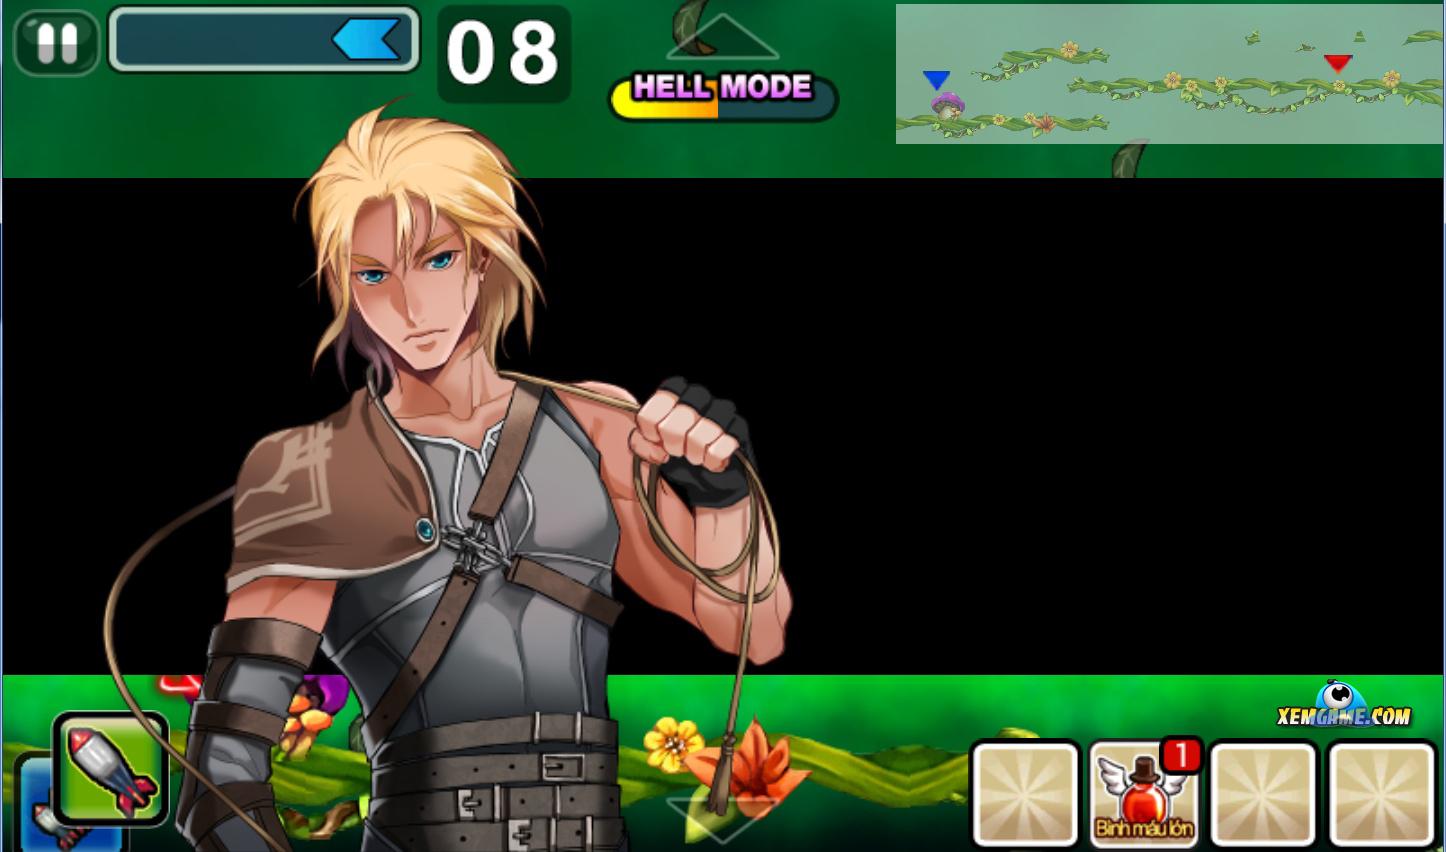 game-oppa_-tank-mobile-2.jpg (1446×852)